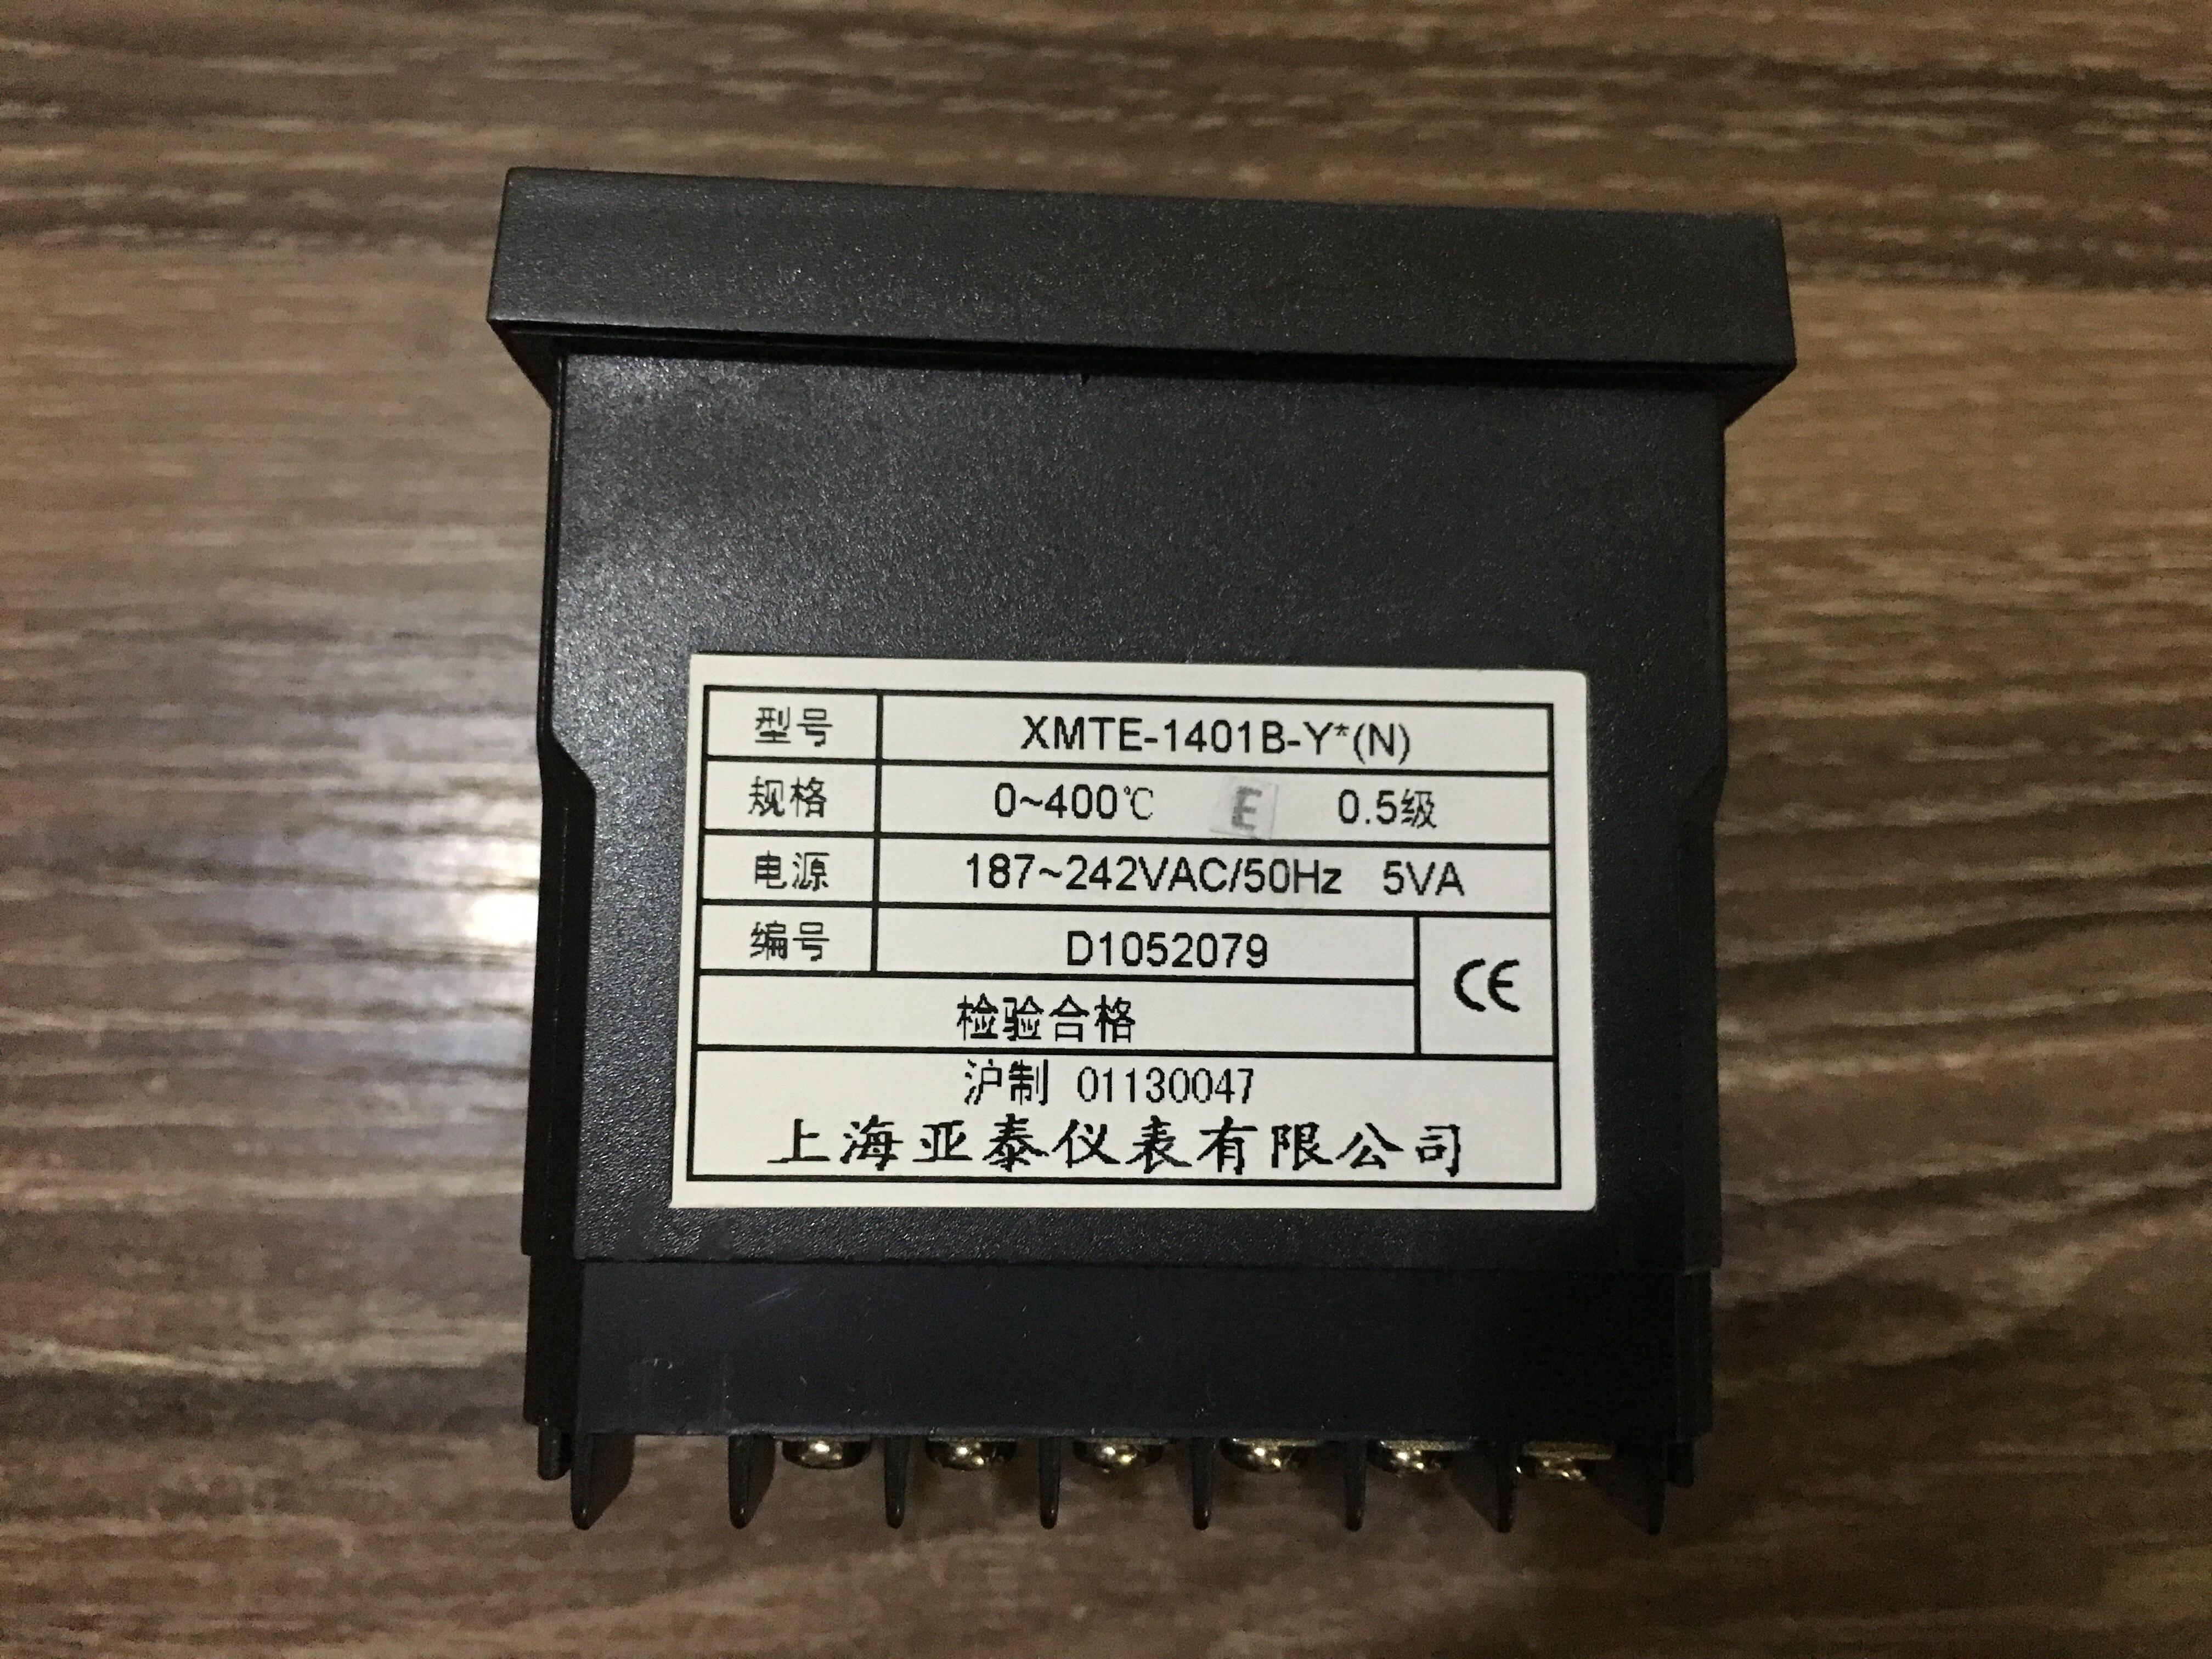 AISET Genuine Shanghai XMTE1000 2 thermostat XMTE 1401B Y temperature controller new original XMTE 1401B Y